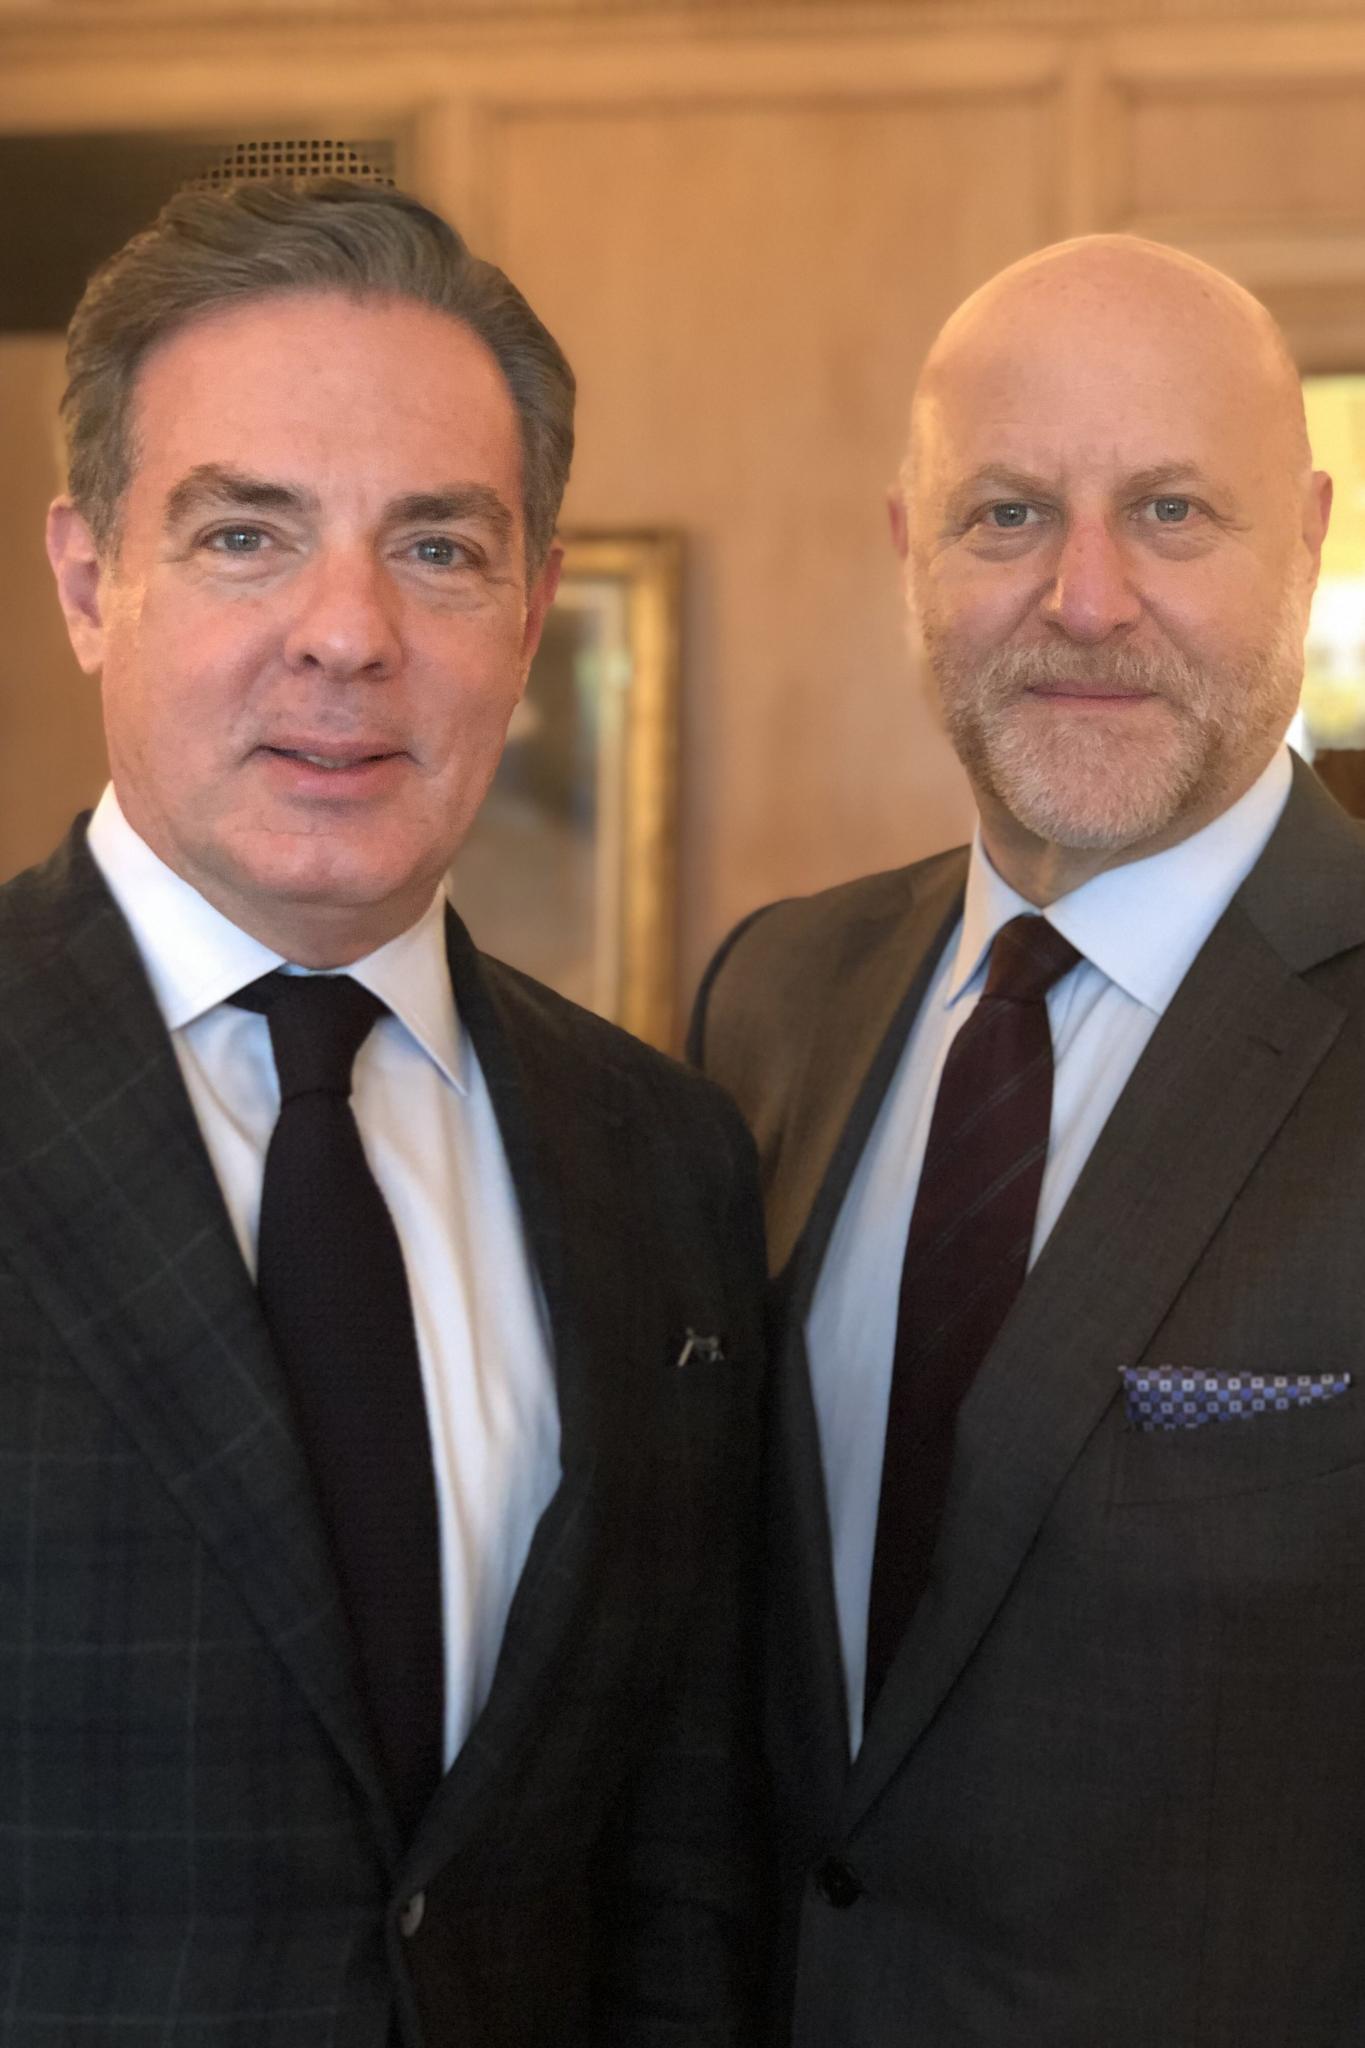 Beekman New York's Christian Keesee and Keith Rosen.